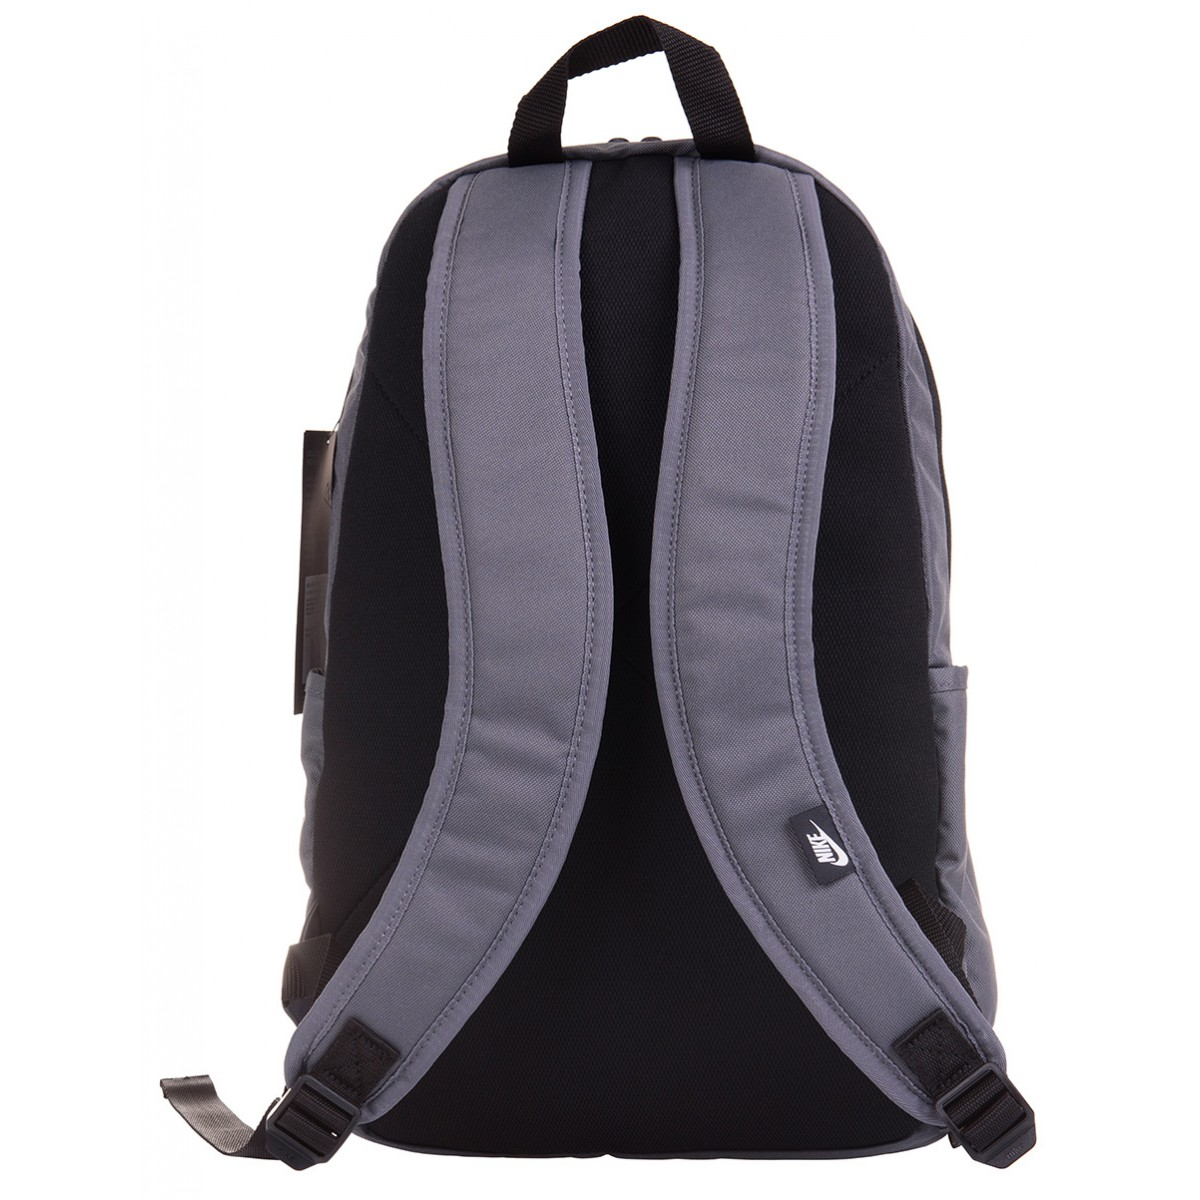 dc4c3b665f259 ... Plecak Nike Ba5381-020